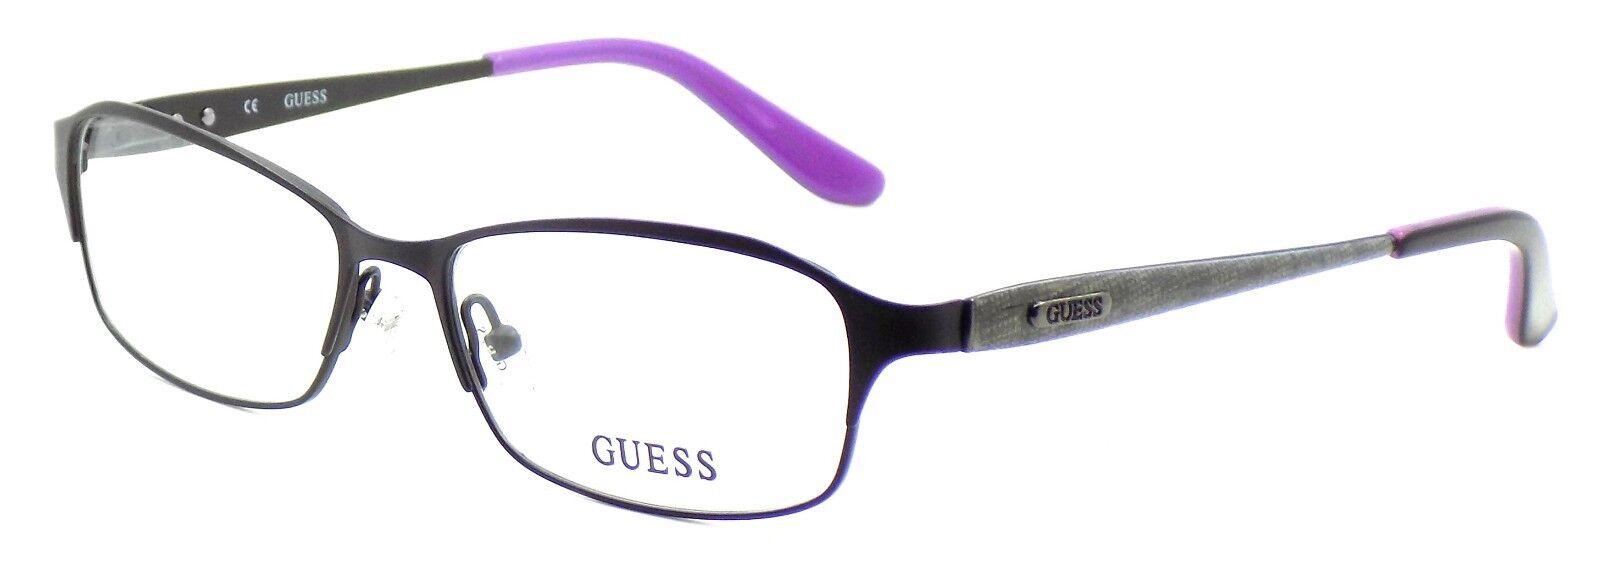 f962838f19b4 GUESS Gu2424 001 Women s Eyeglasses Frames 51-15-135 Black Case for ...